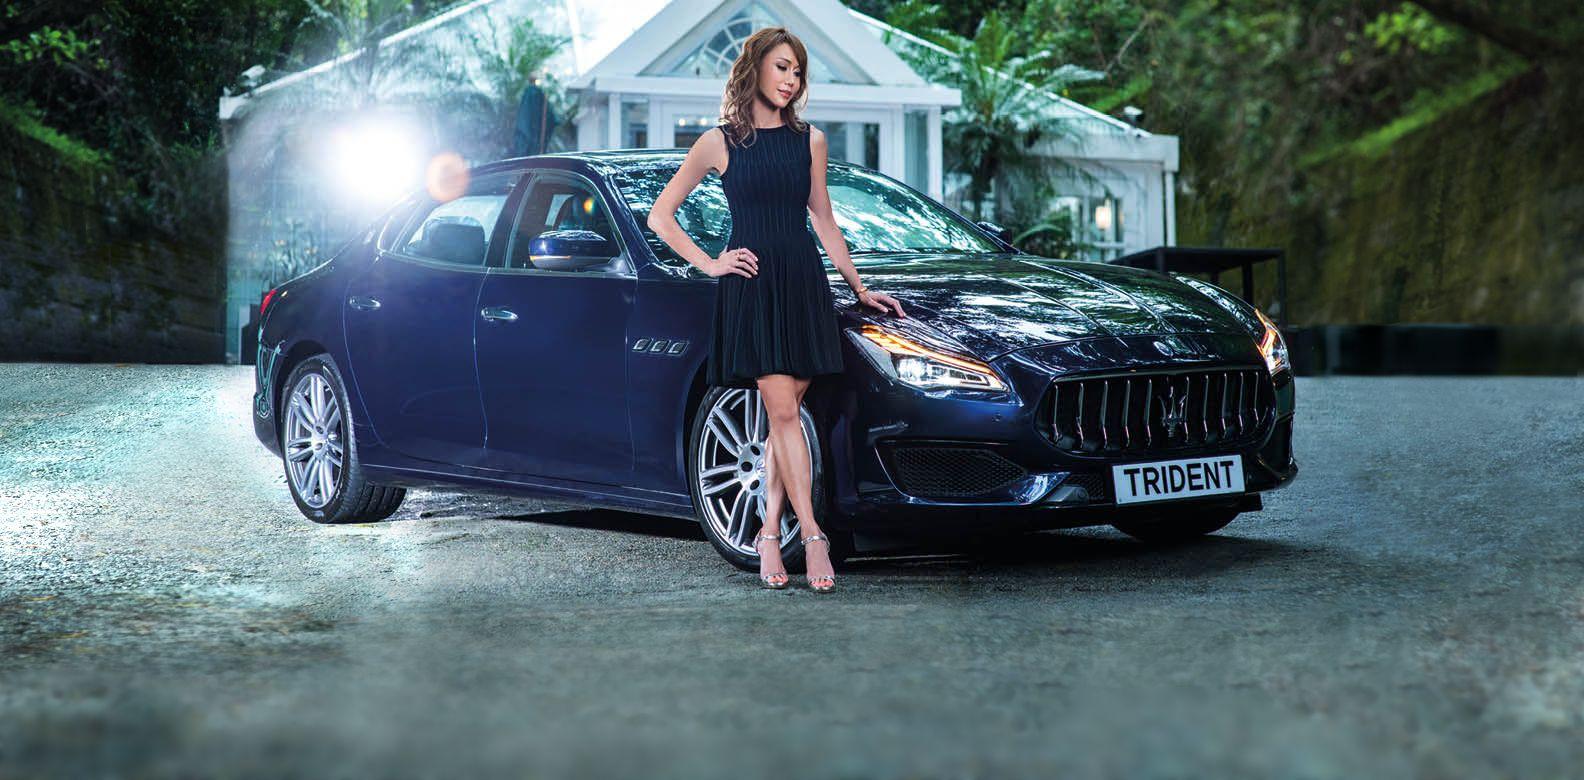 The Maserati Quattroporte GTS GranSport Is Elegance In Motion